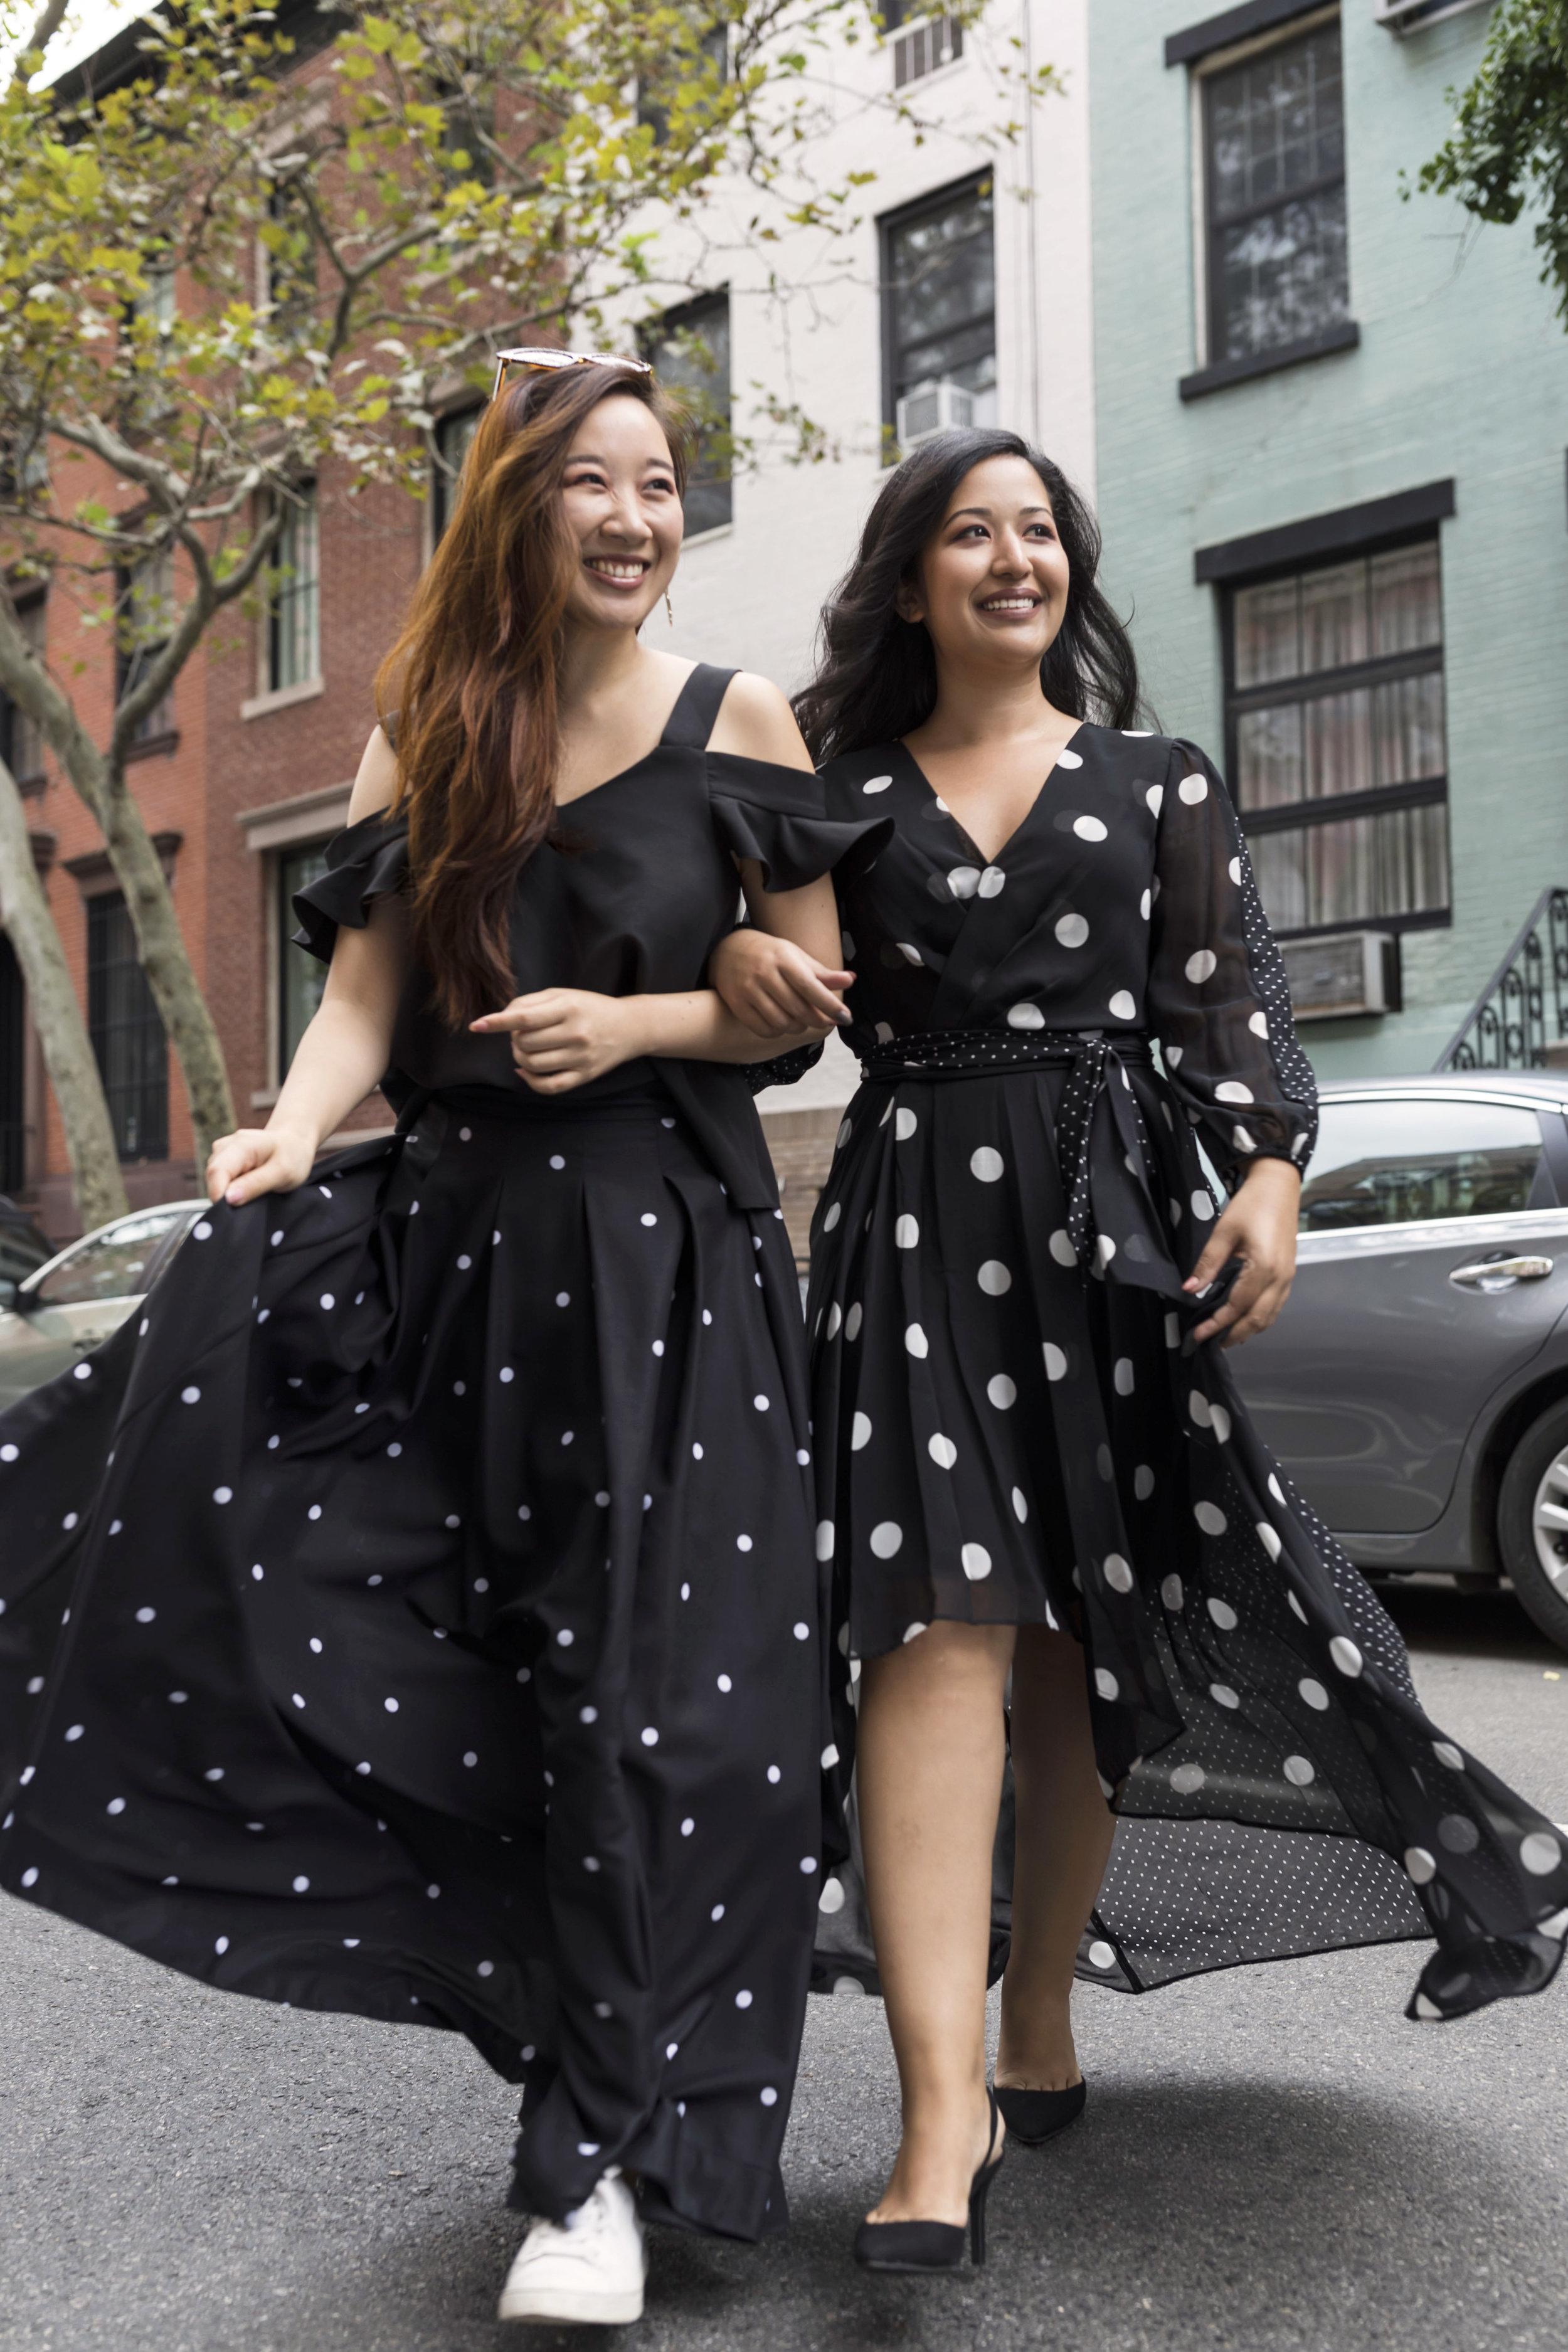 Krity S Fall Trends Polka Dot Dress